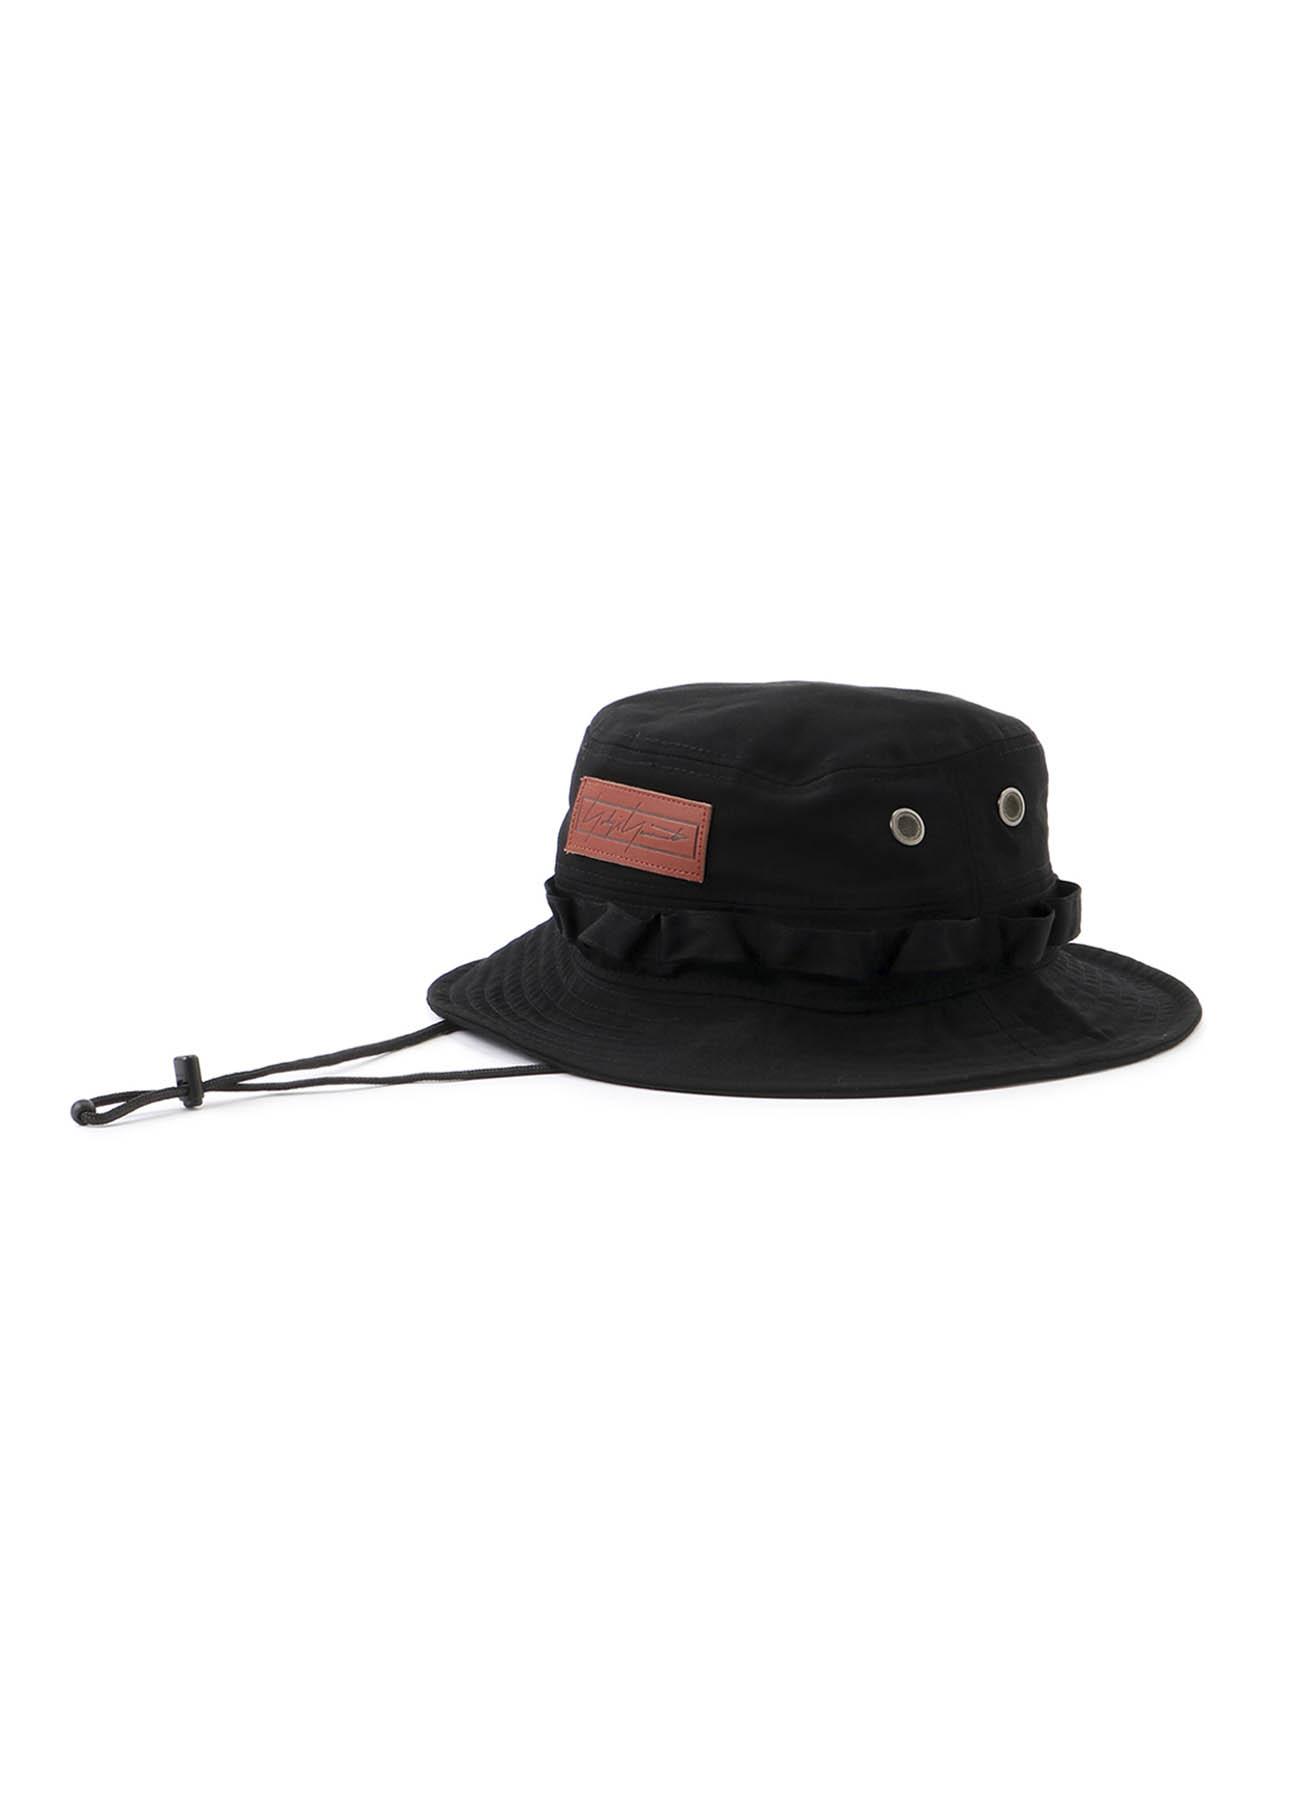 Yohji Yamamoto × New Era ADVENTURE HAT ウールギャバジン